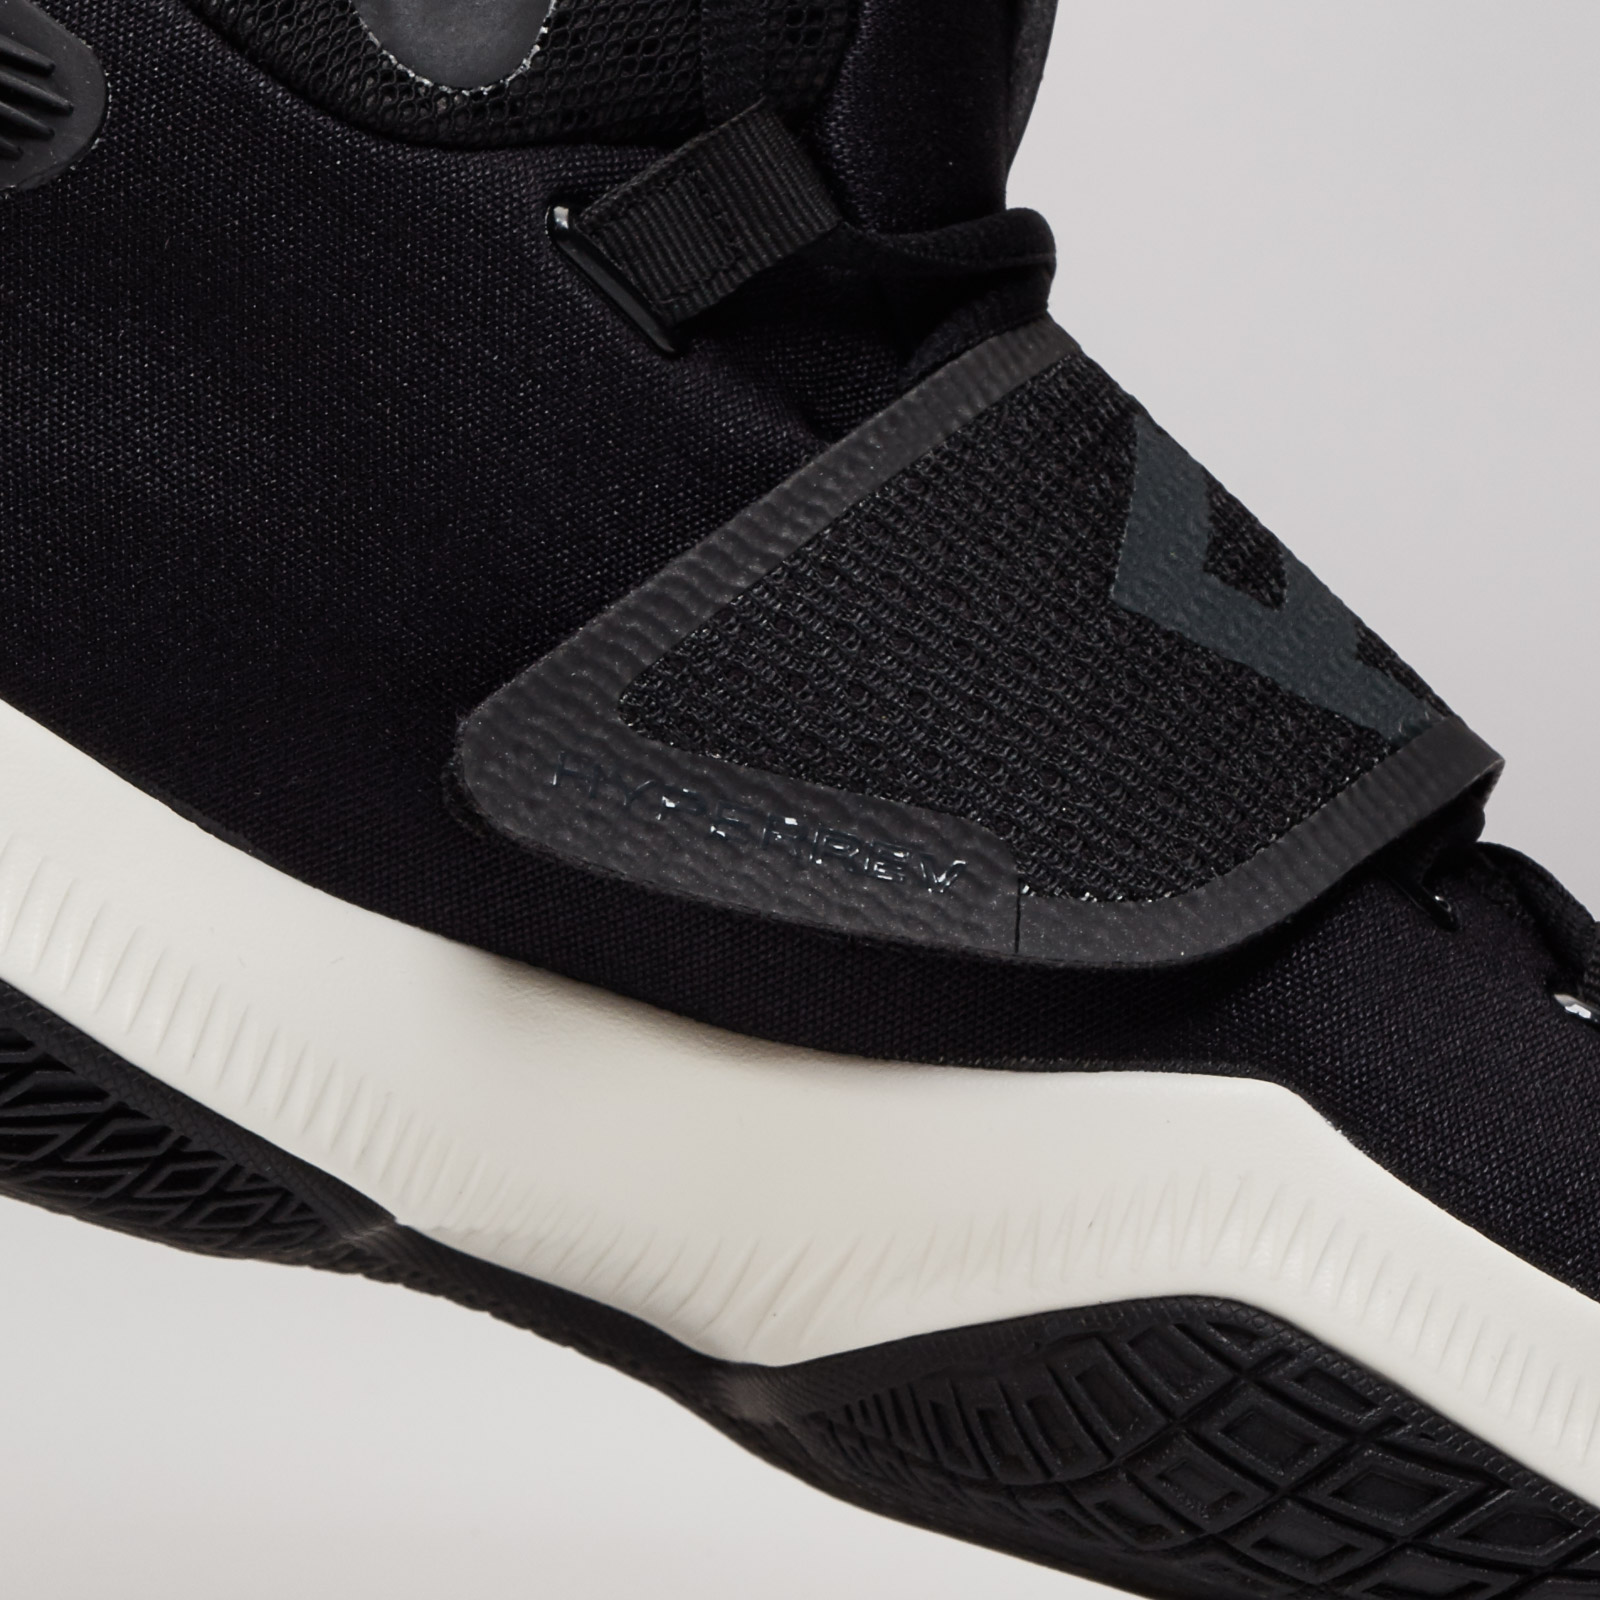 908f28492ba1 Nike Zoom Hyperrev 2016 Fragment - 848556-001 - Sneakersnstuff ...